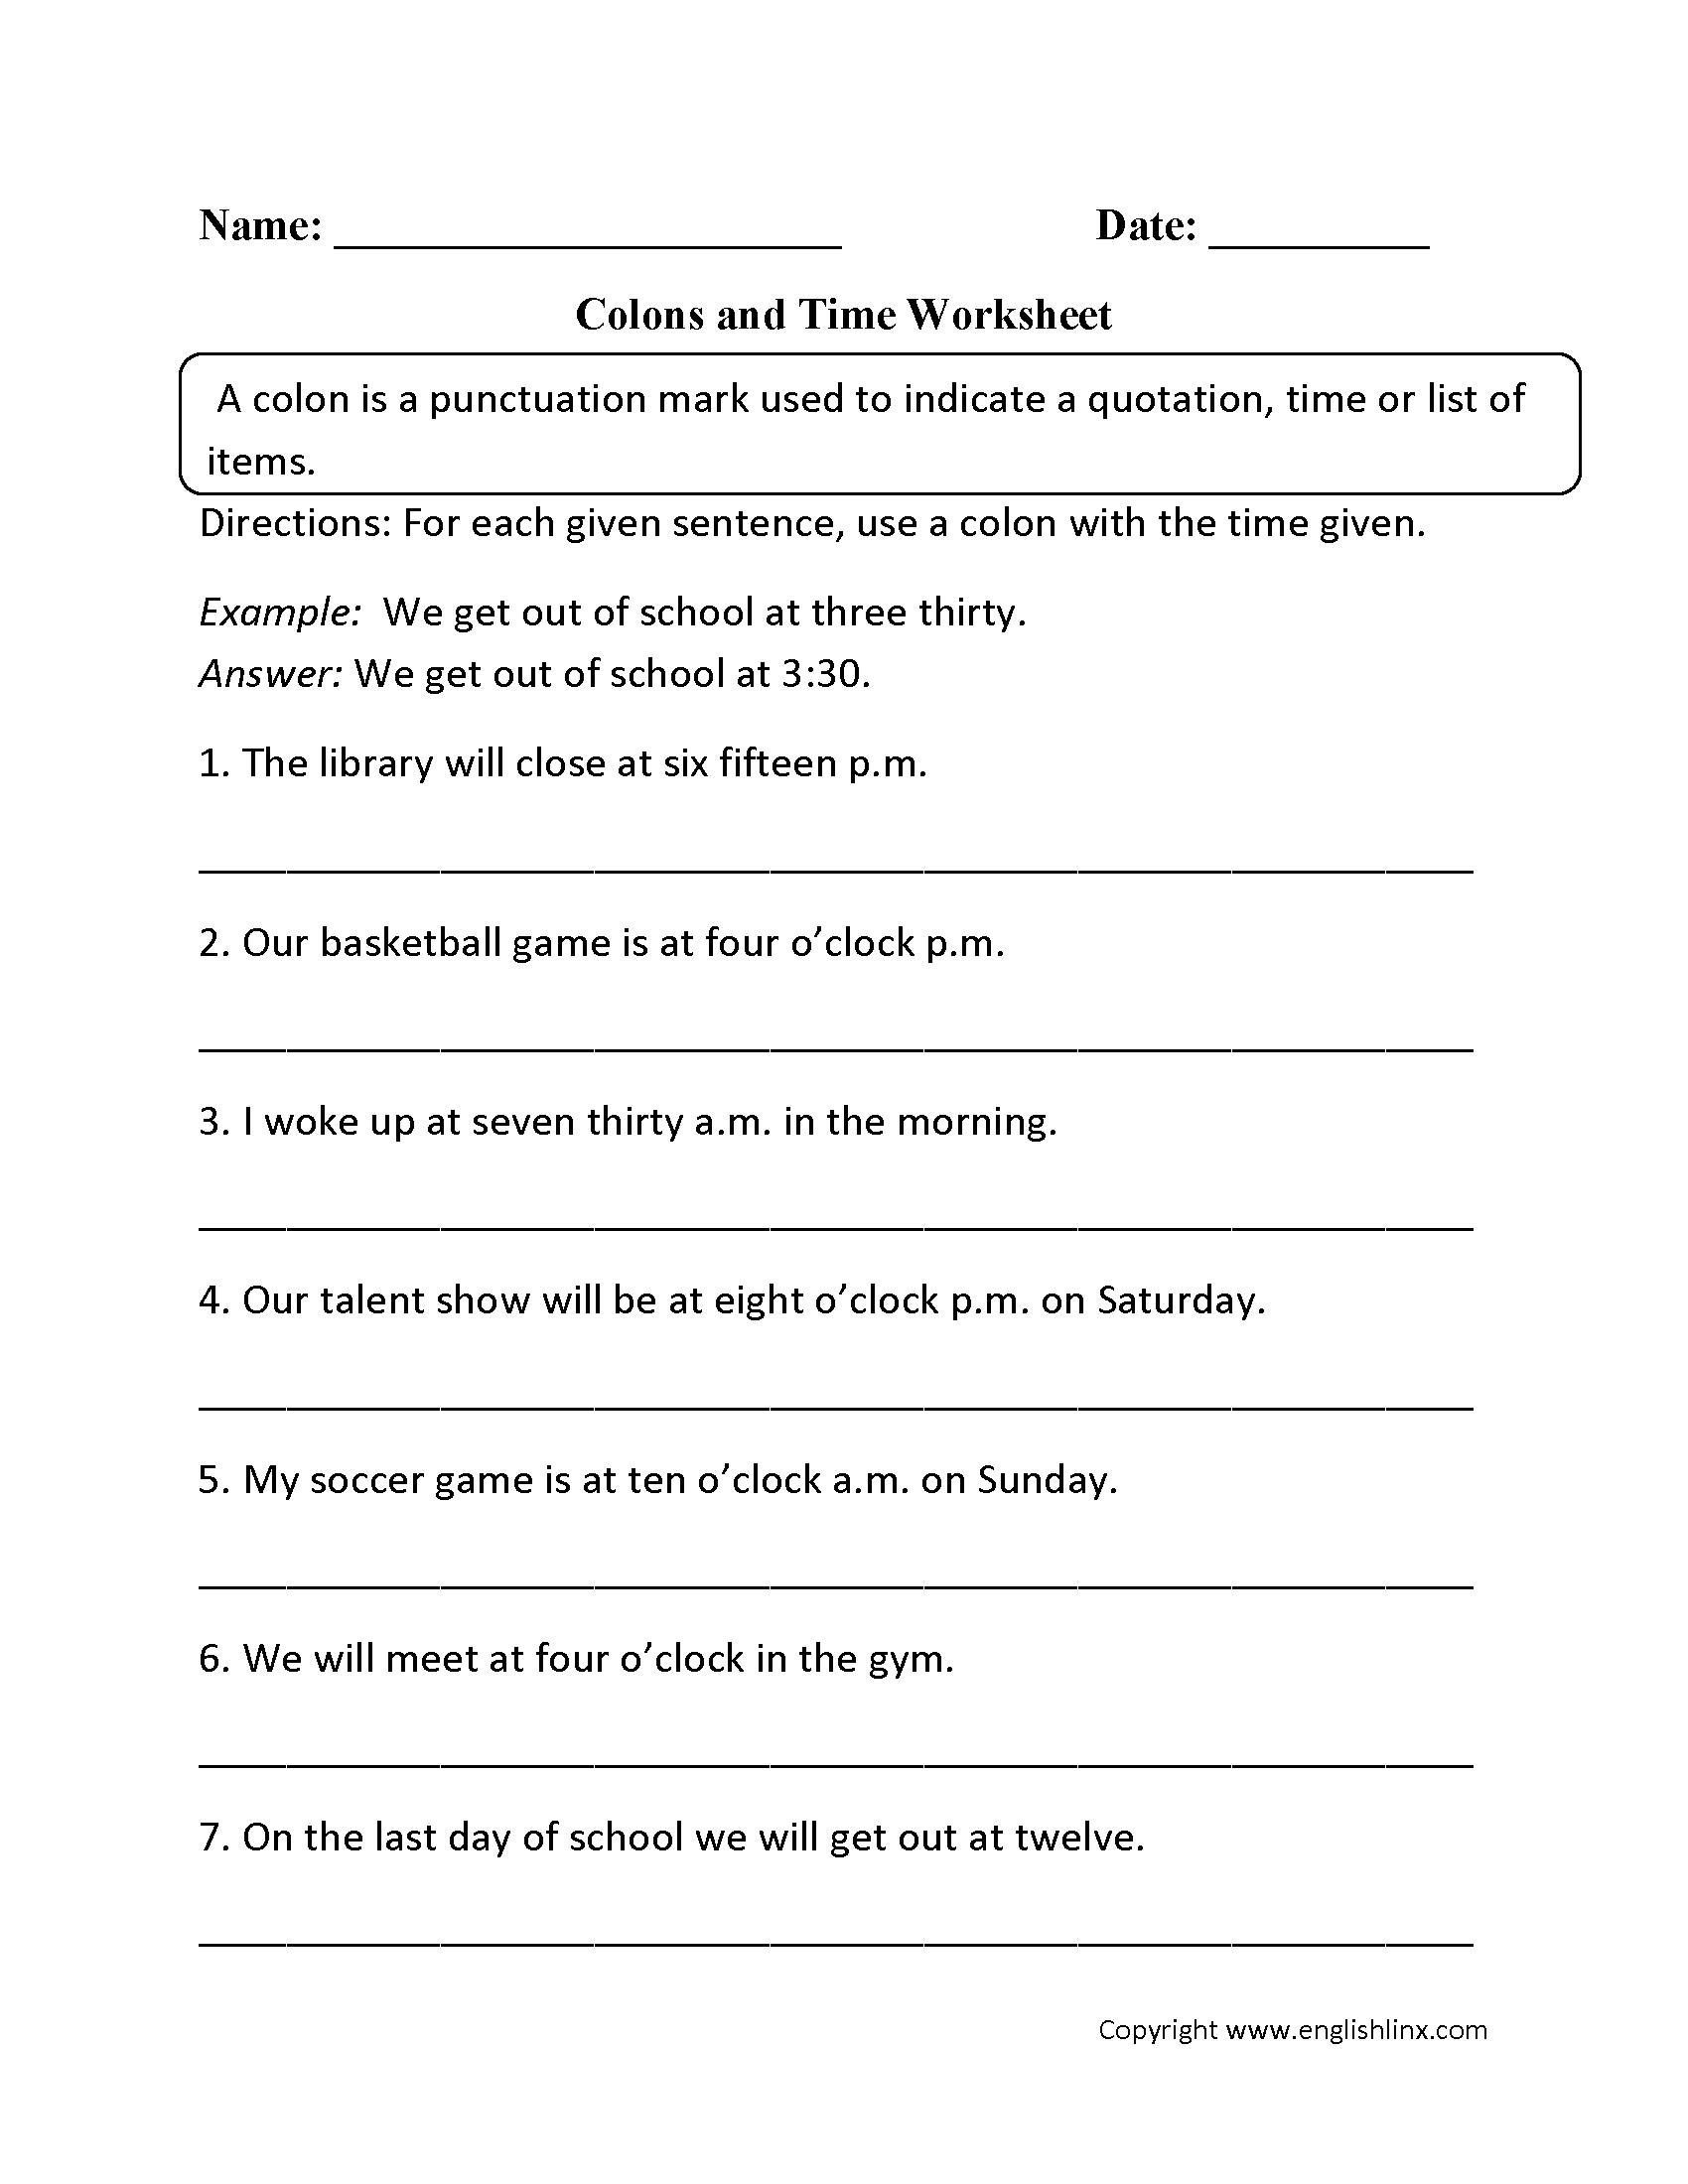 Punctuation Worksheets | Colon Worksheets | Grammar Worksheets Year 6 Printable